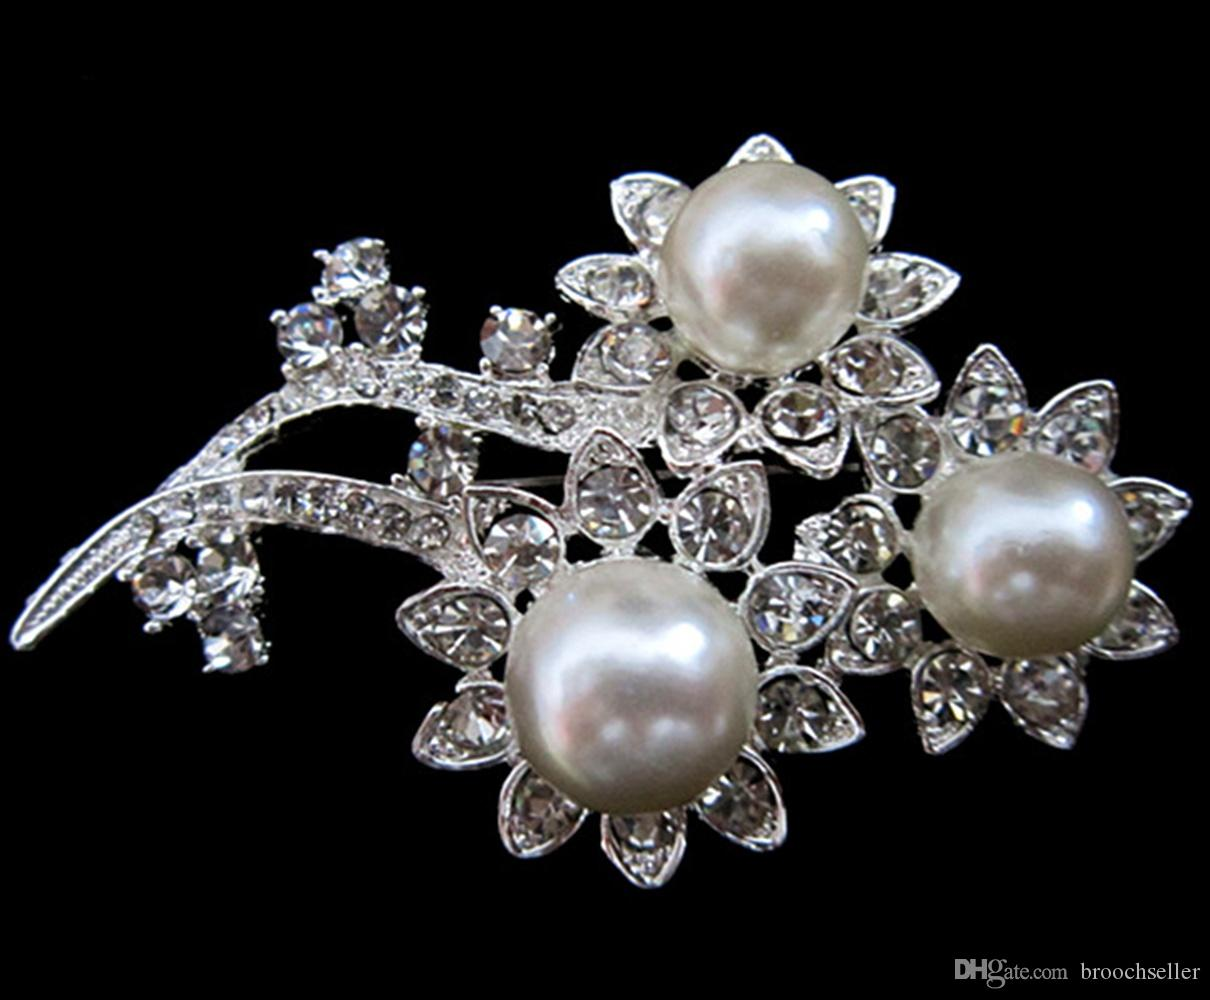 Bloemontwerp Verzilverd Clear Rhinestone Crystal White Pearl Broche